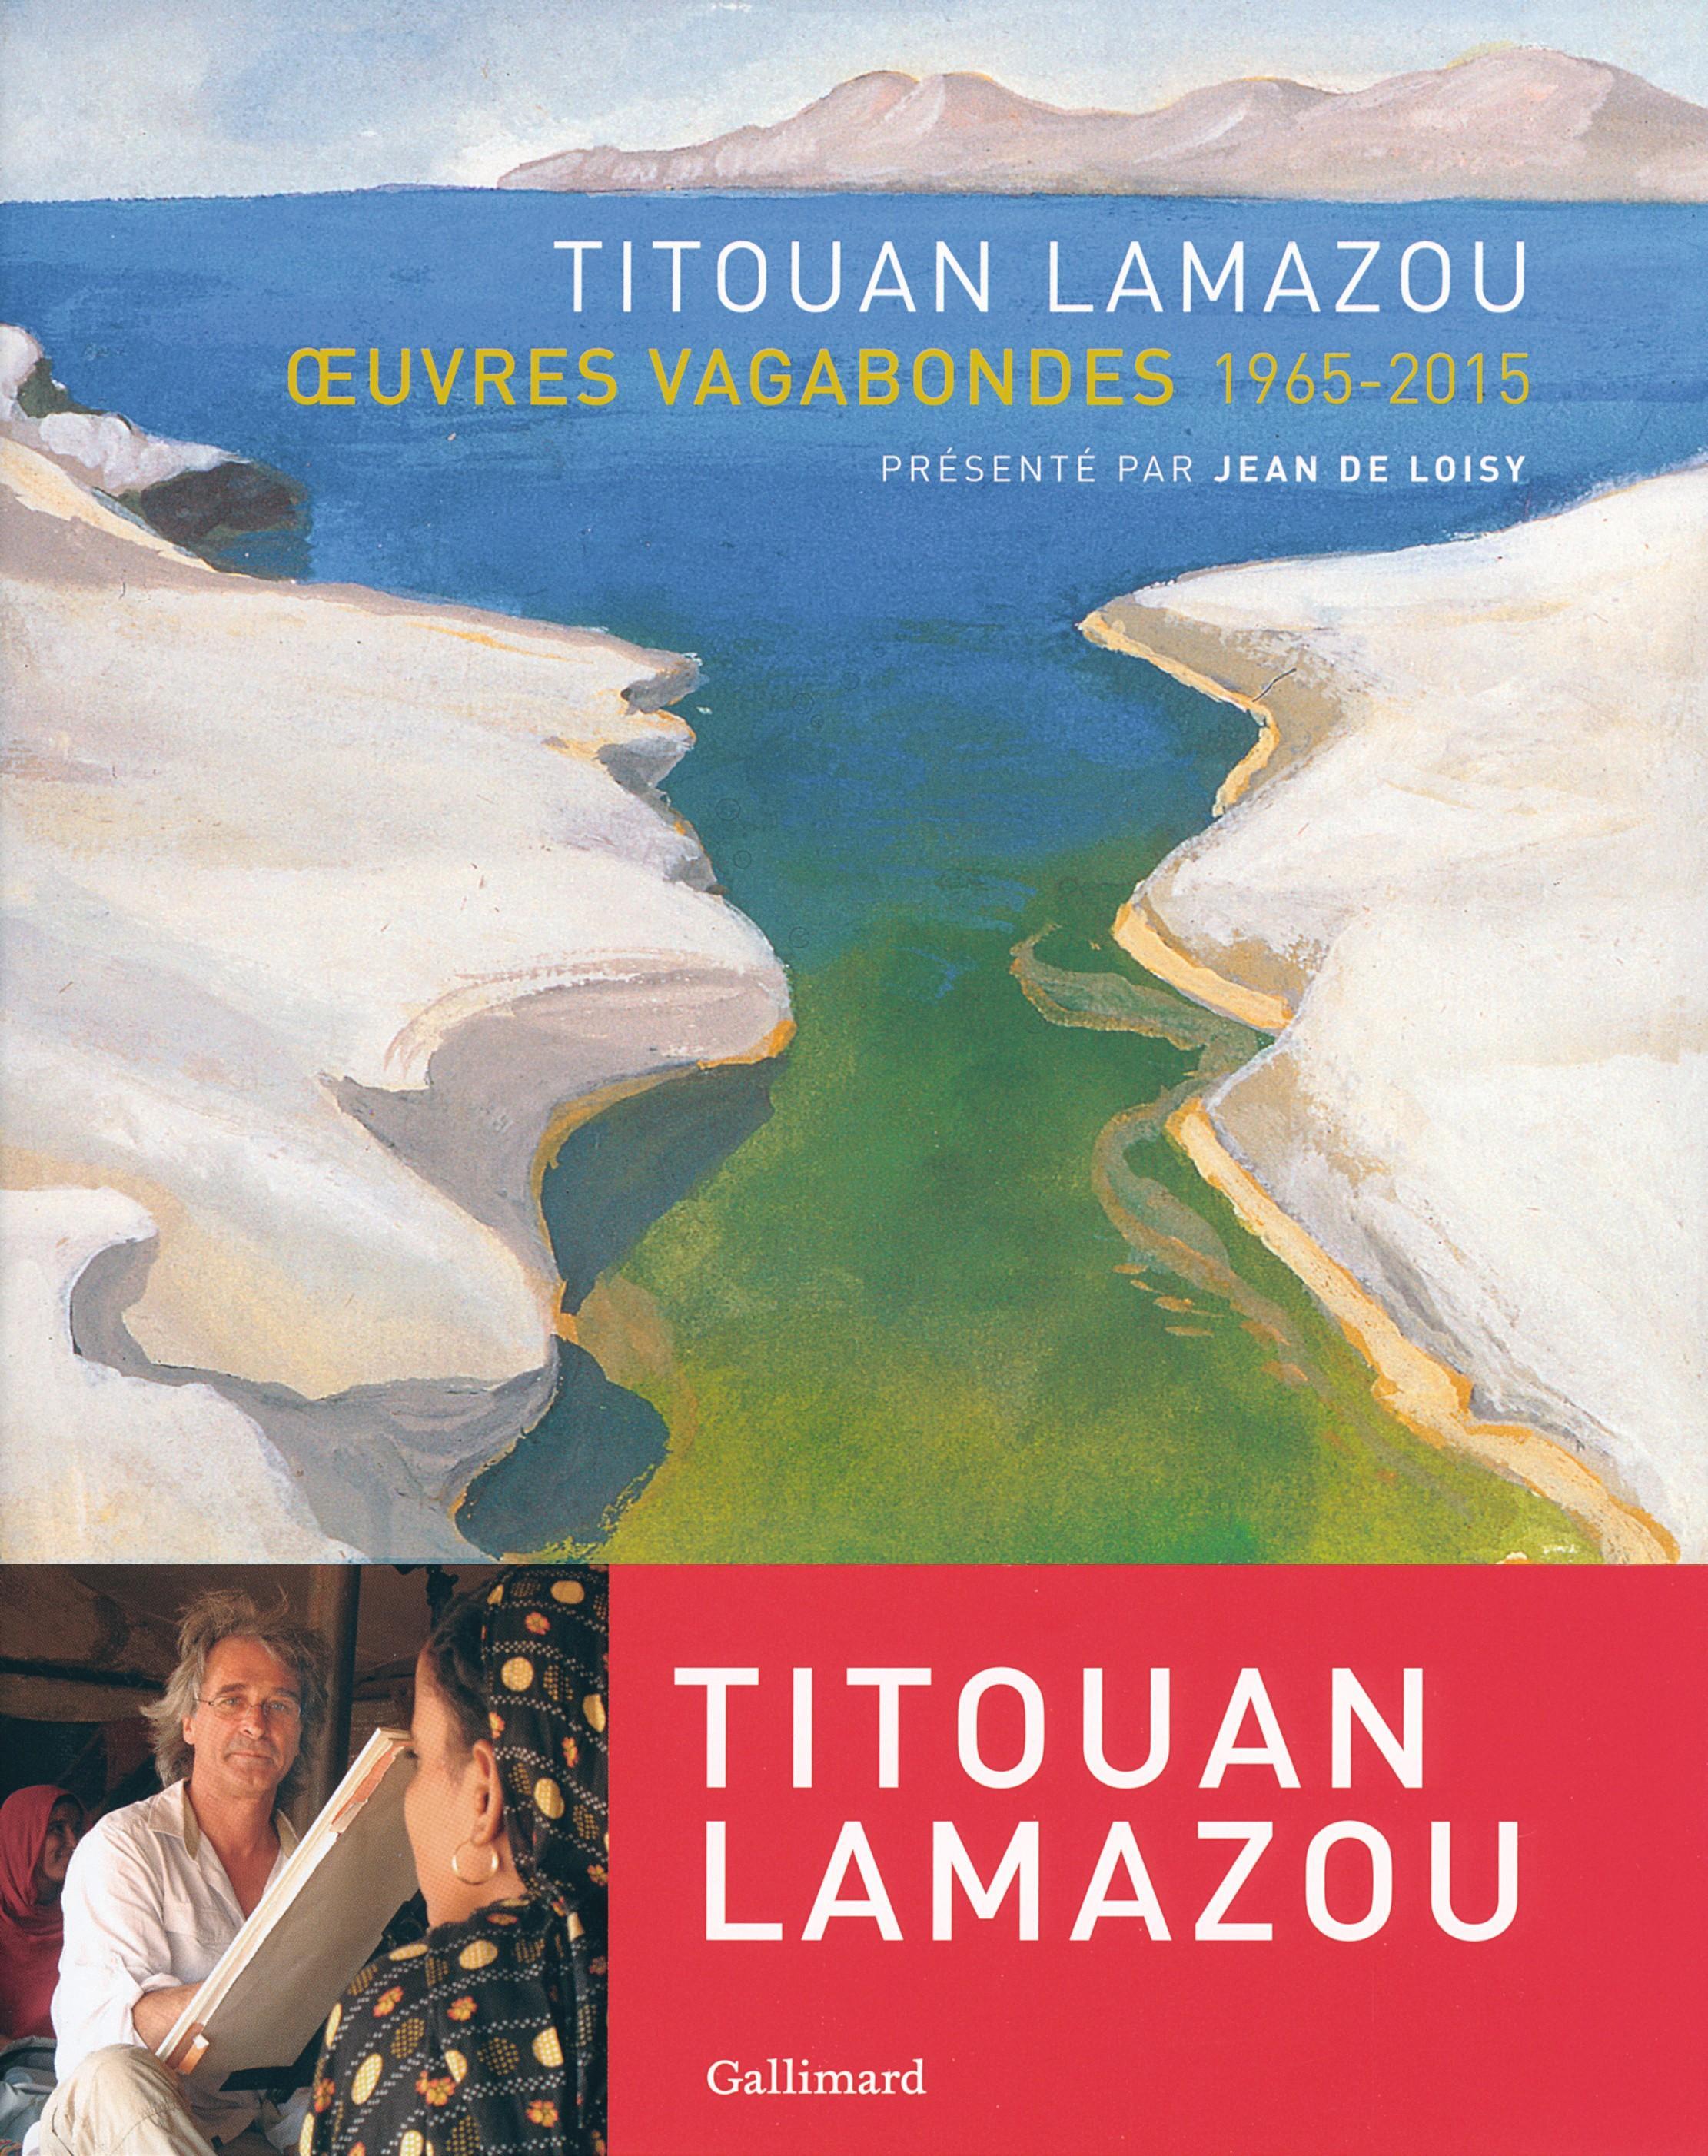 Titouan Lamazou, Œuvres vagabondes, 2016, Gallimard Loisirs.